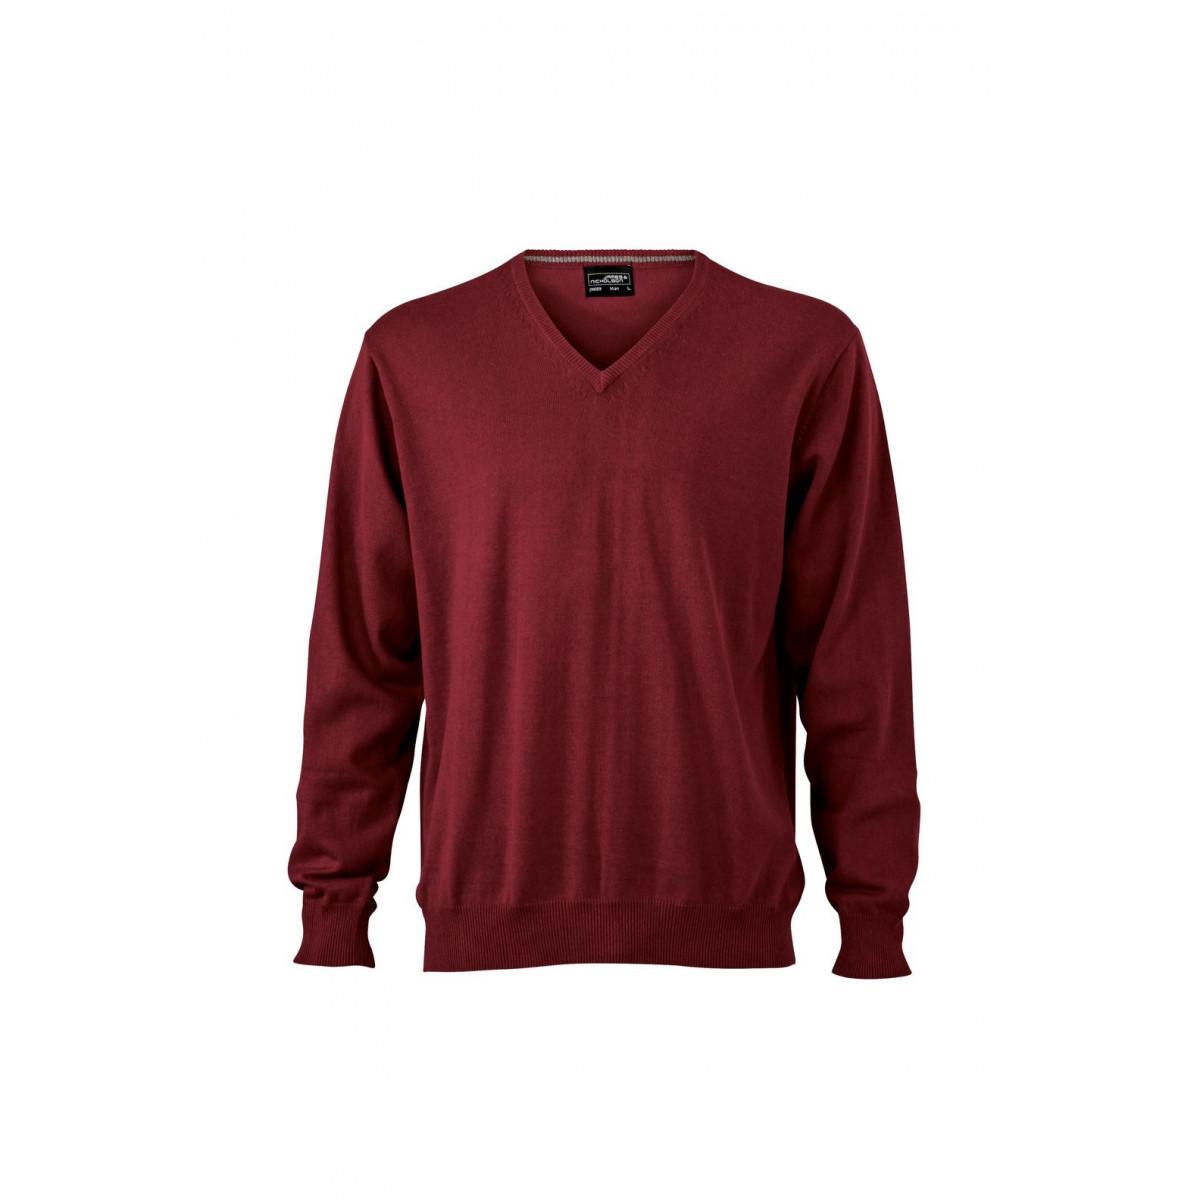 Пуловер мужской JN659 Mens V-Neck Pullover - Бордовый